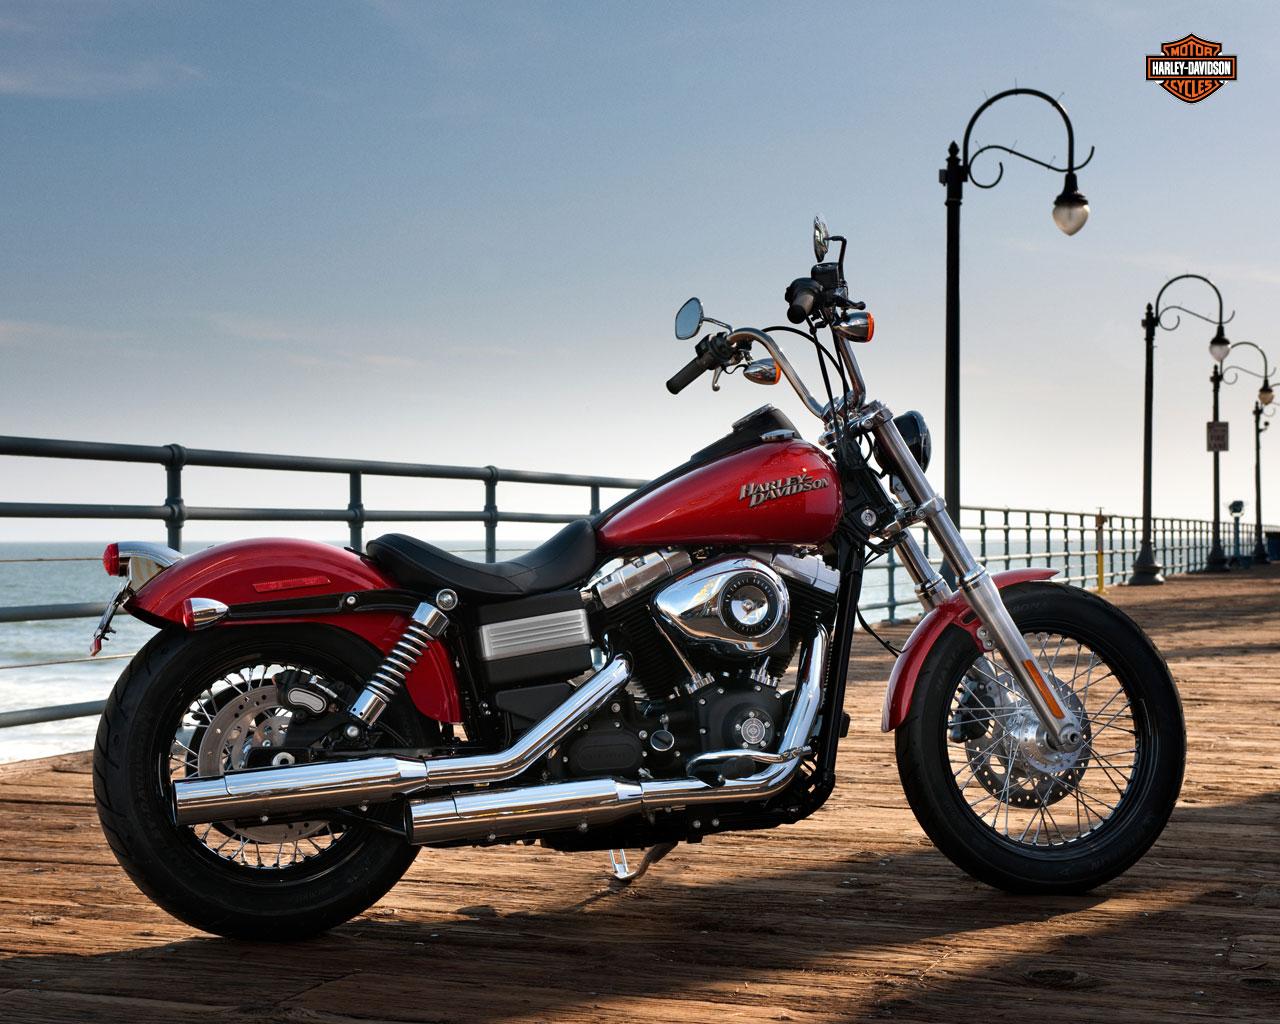 Harley Davidson Street Bob Wallpaper My Car Gear 1280x1024